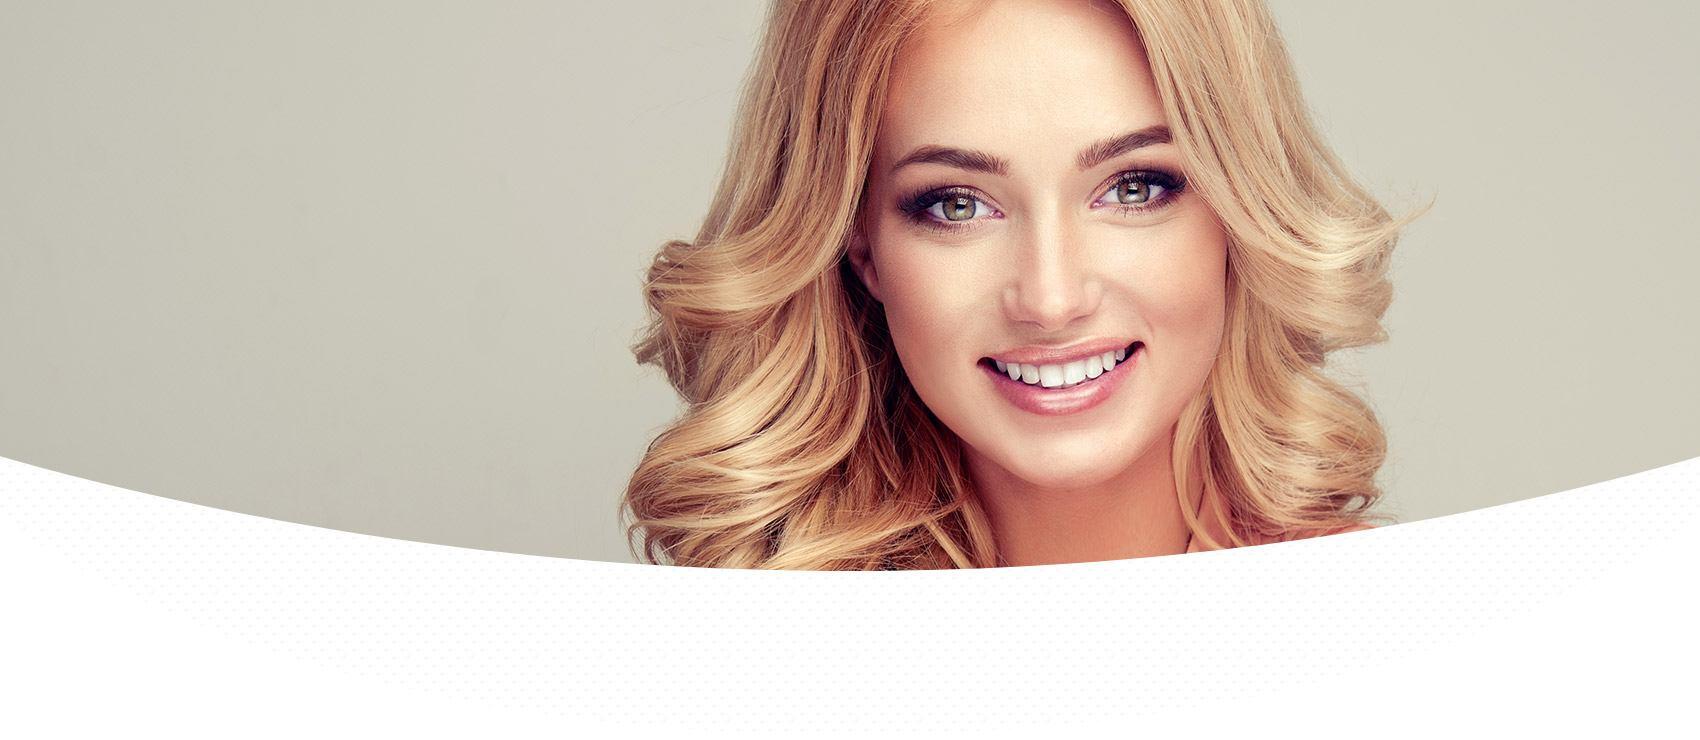 Cosmetic Dentistry - North Aurora Smiles